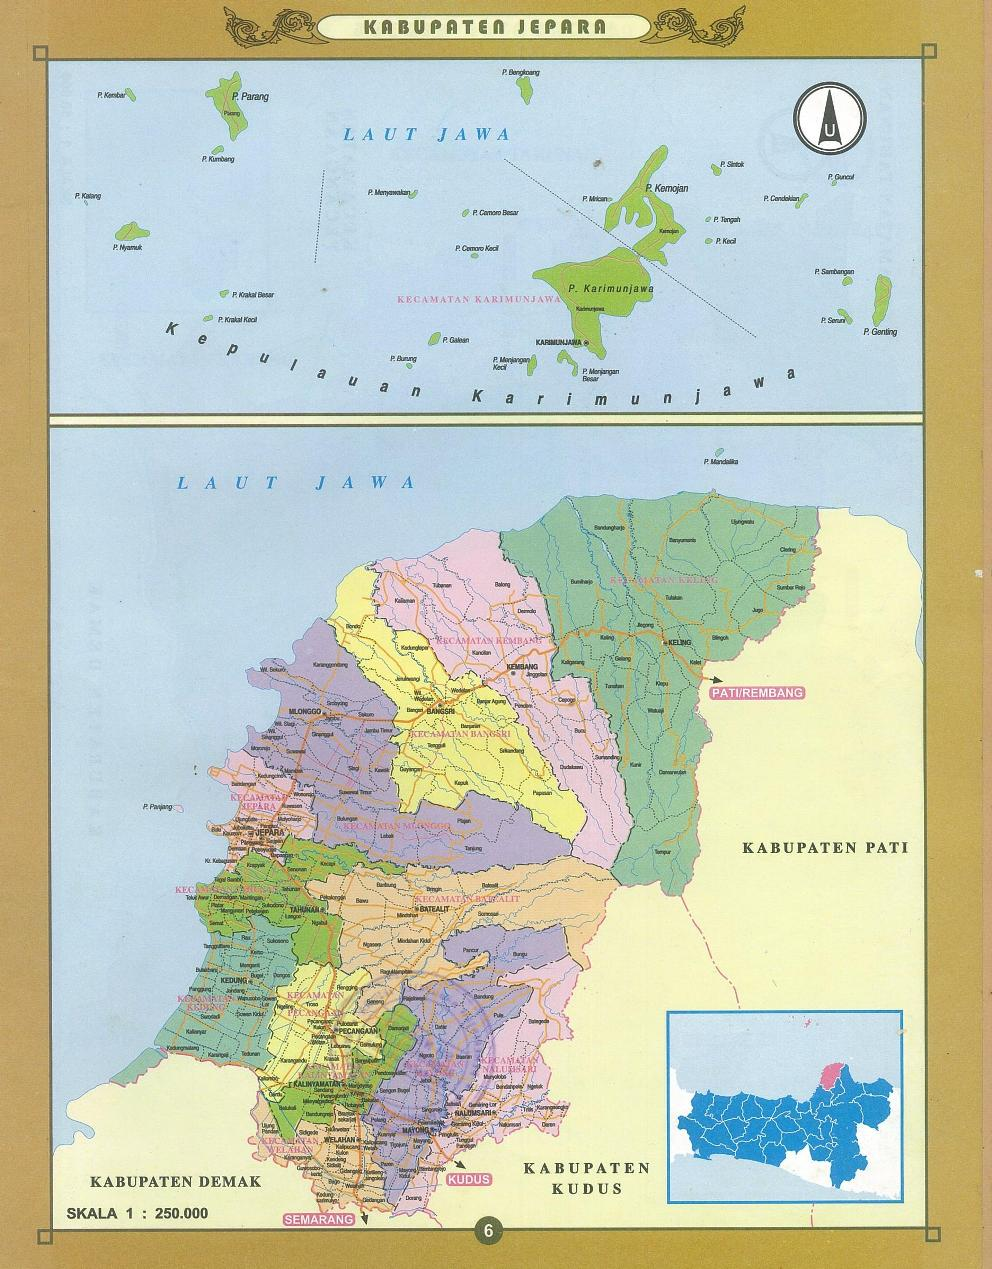 Peta Kabupaten Jepara